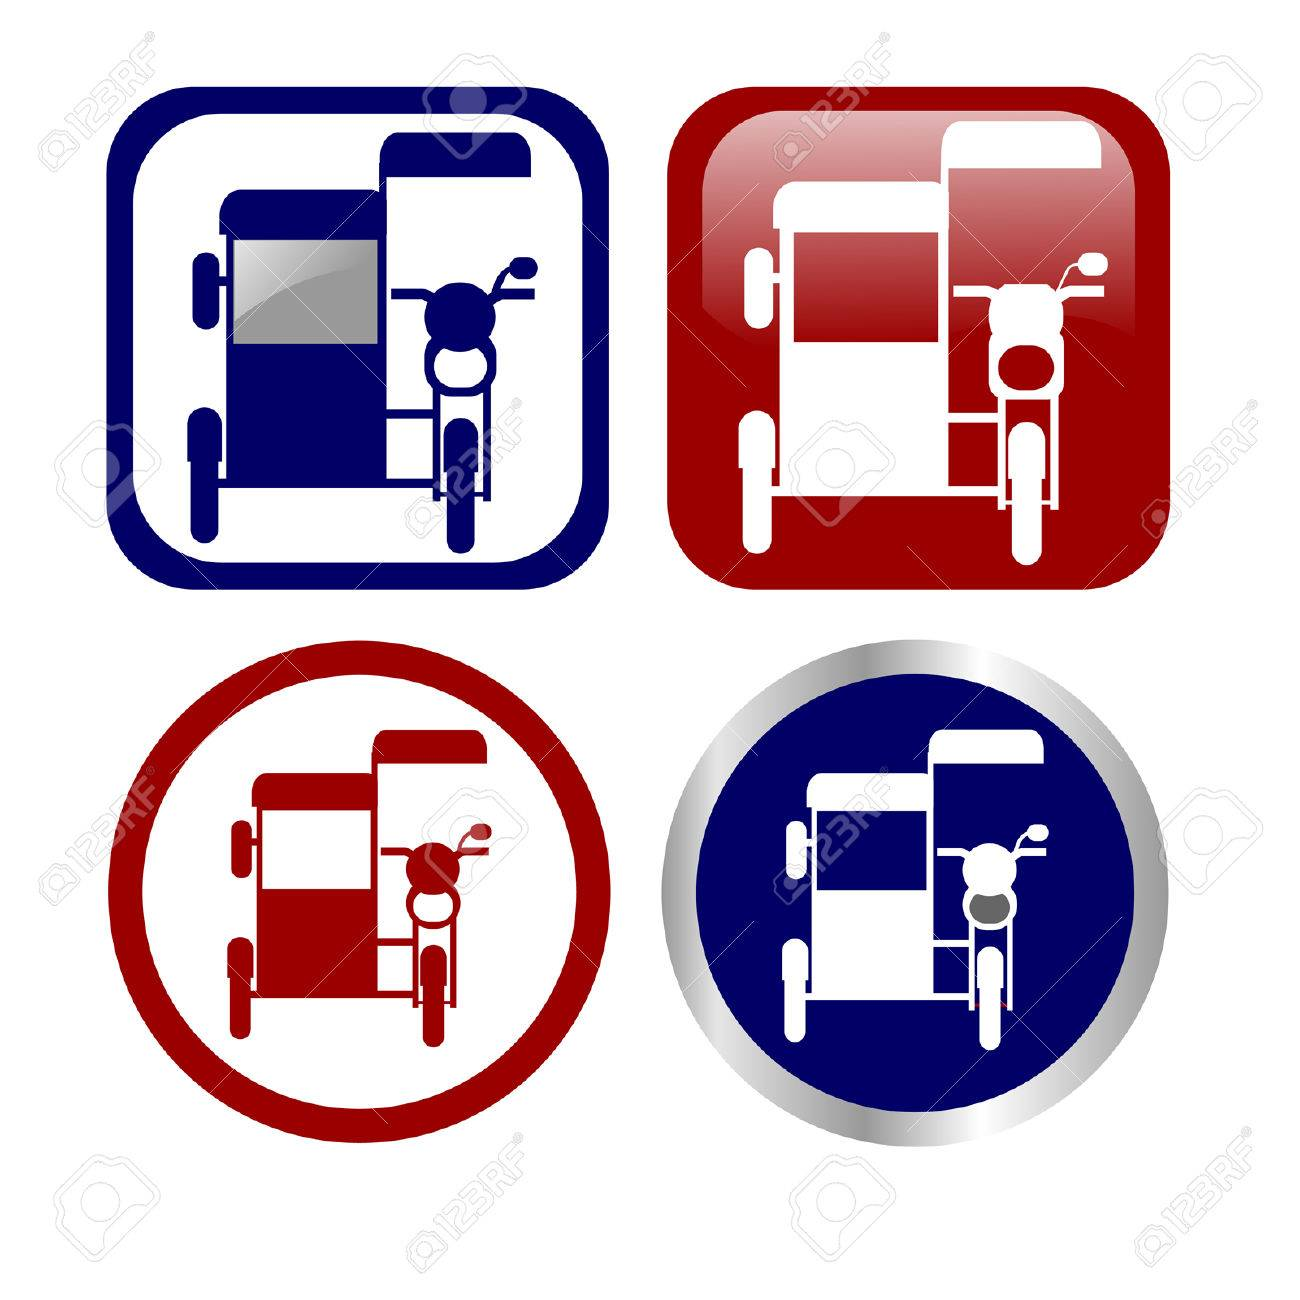 Philippine tricycle icon set - 24188808